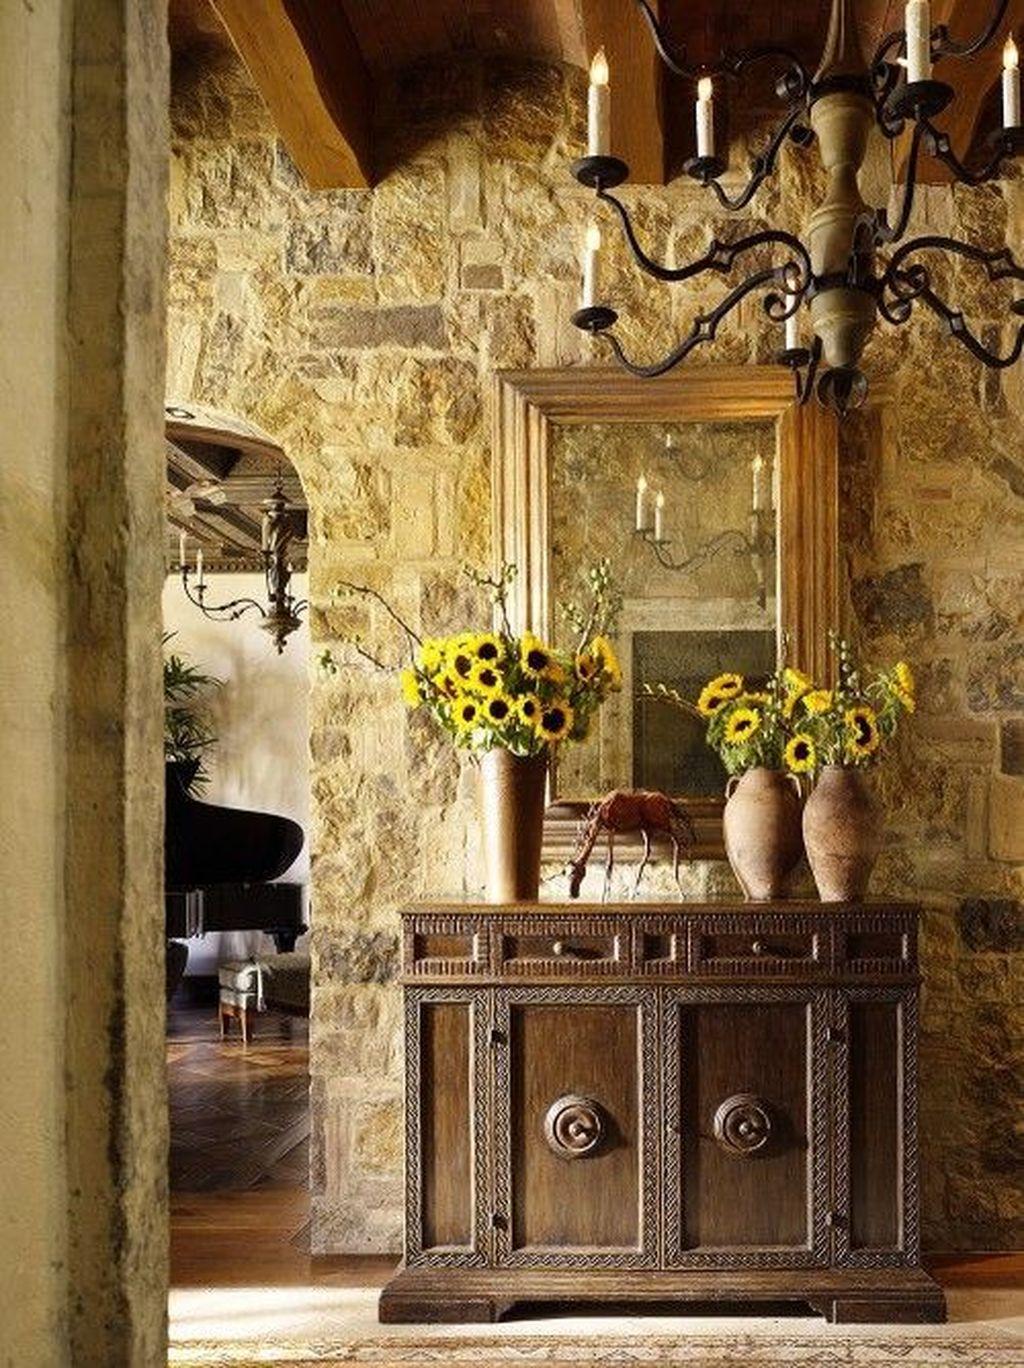 Fabulous Rustic Italian Decor Ideas For Your Home 30